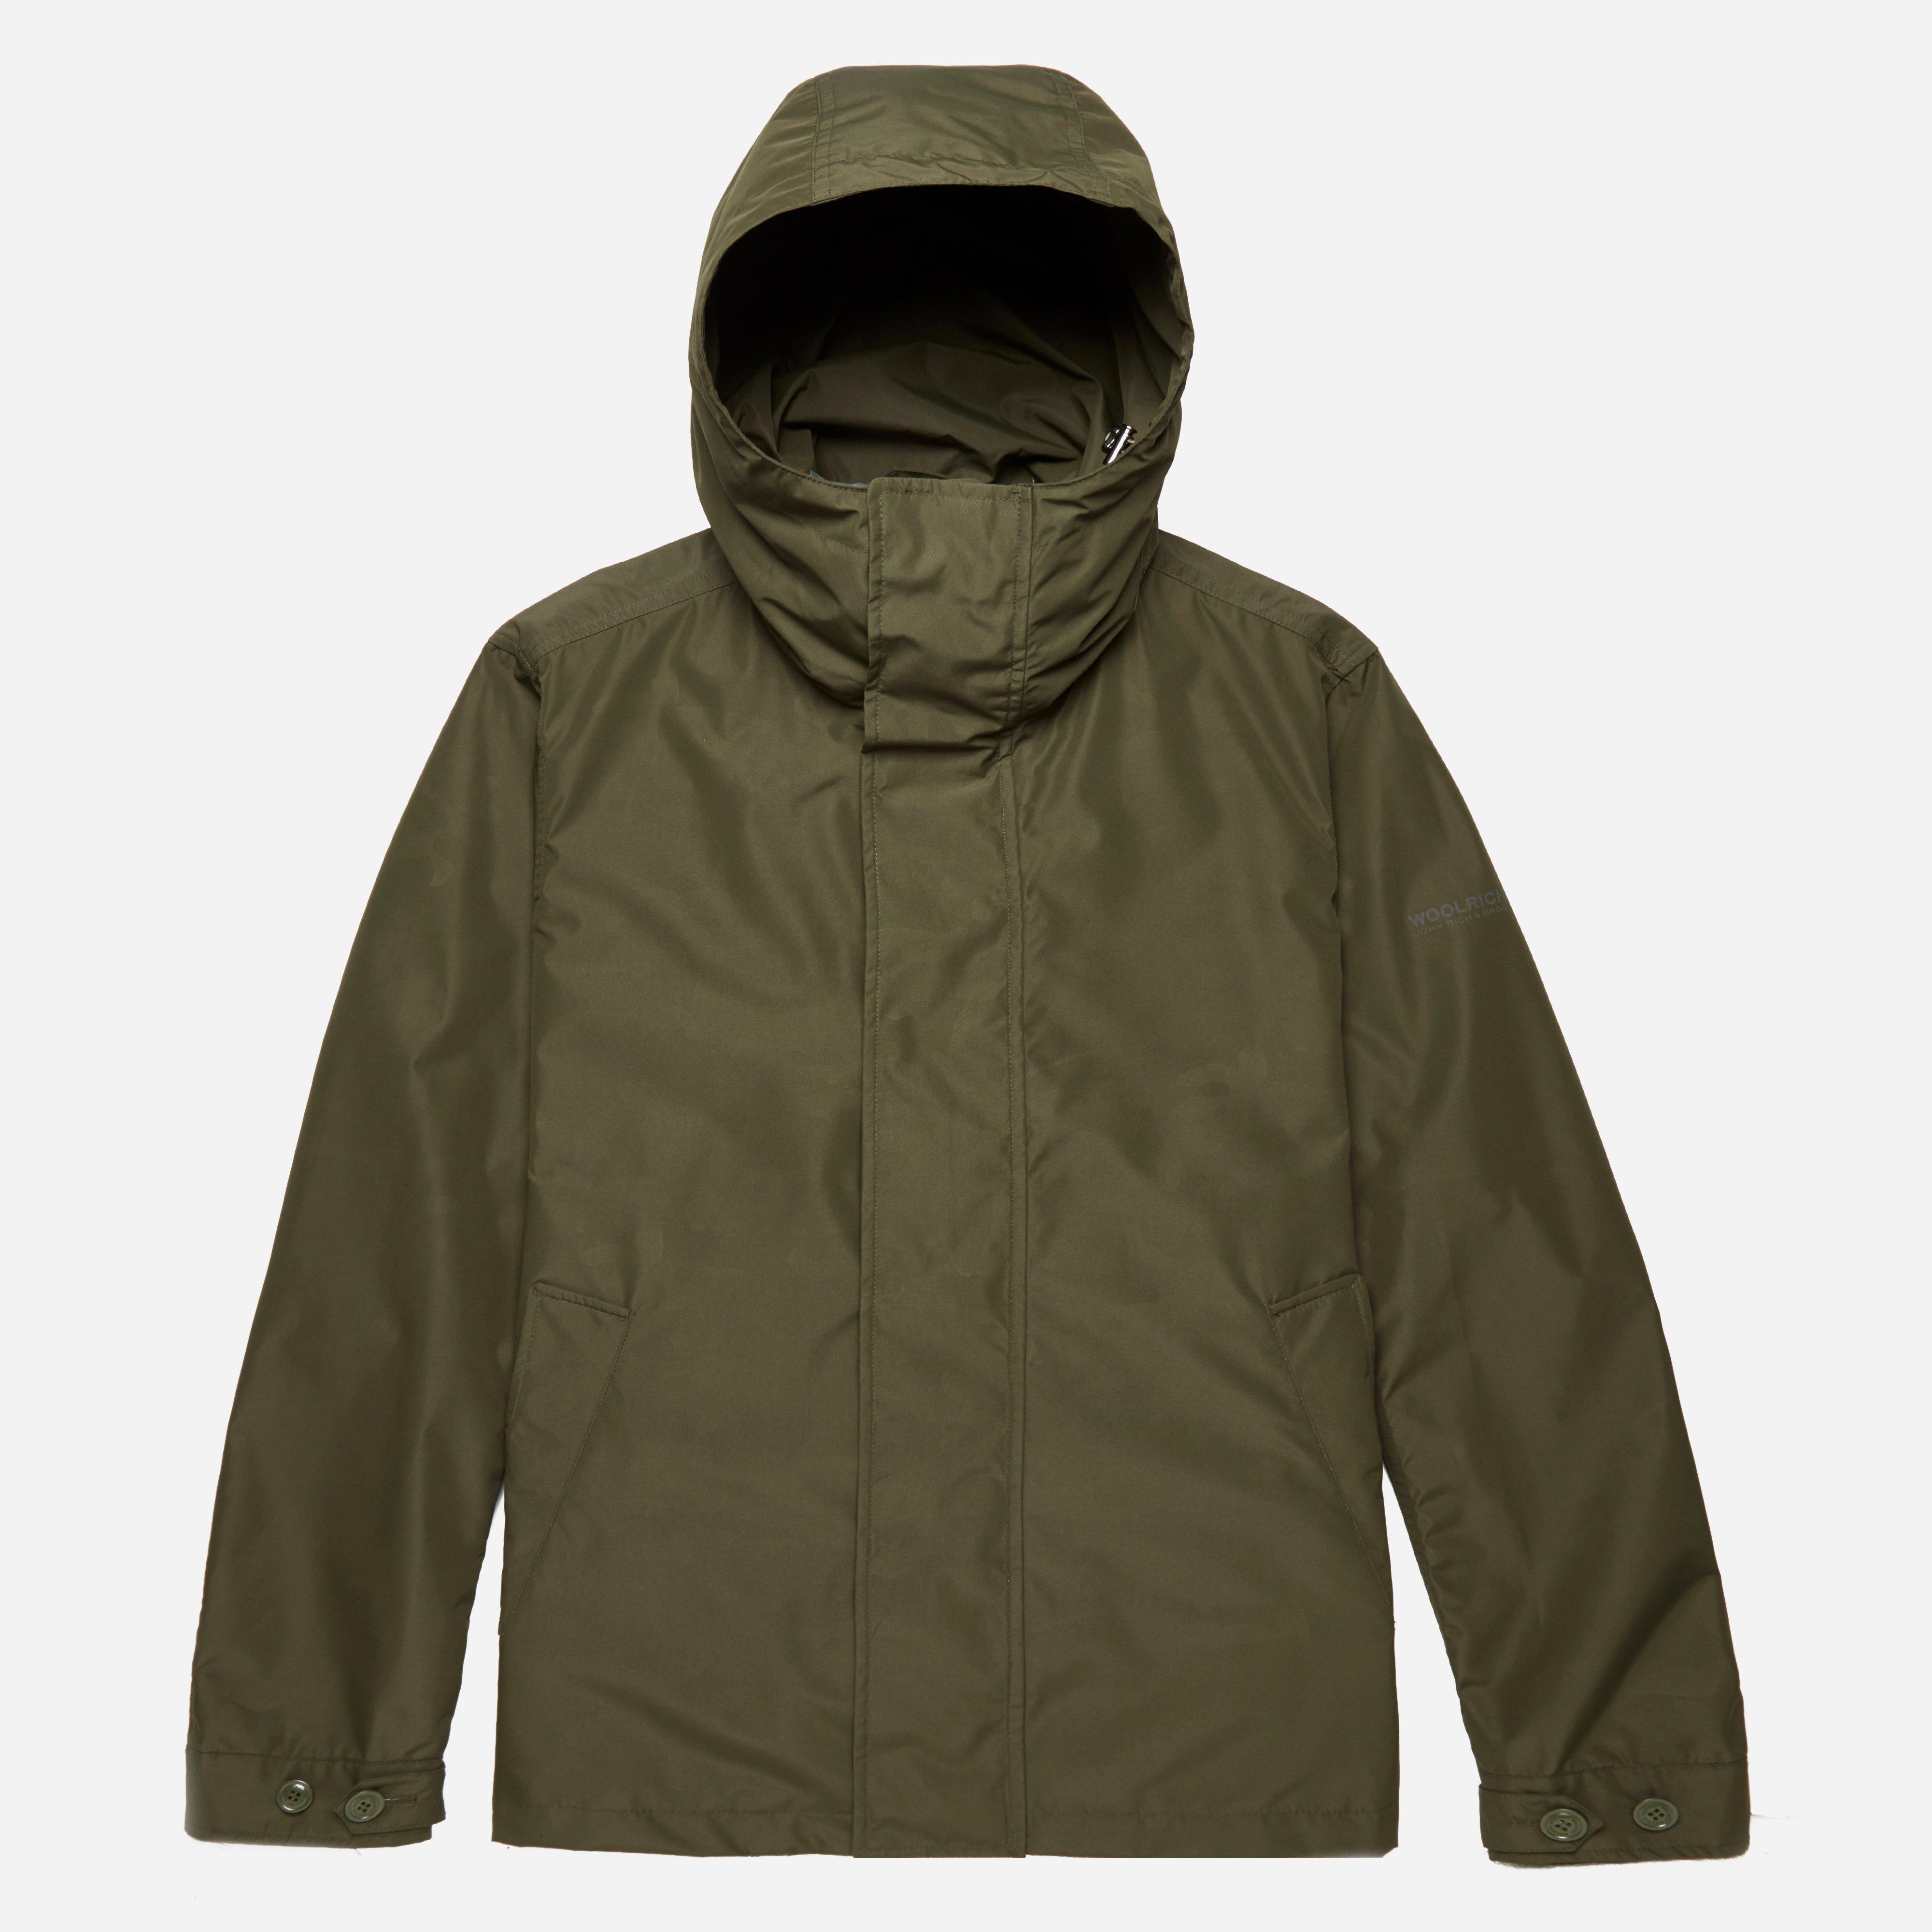 Woolrich Camou Rudder Jacket